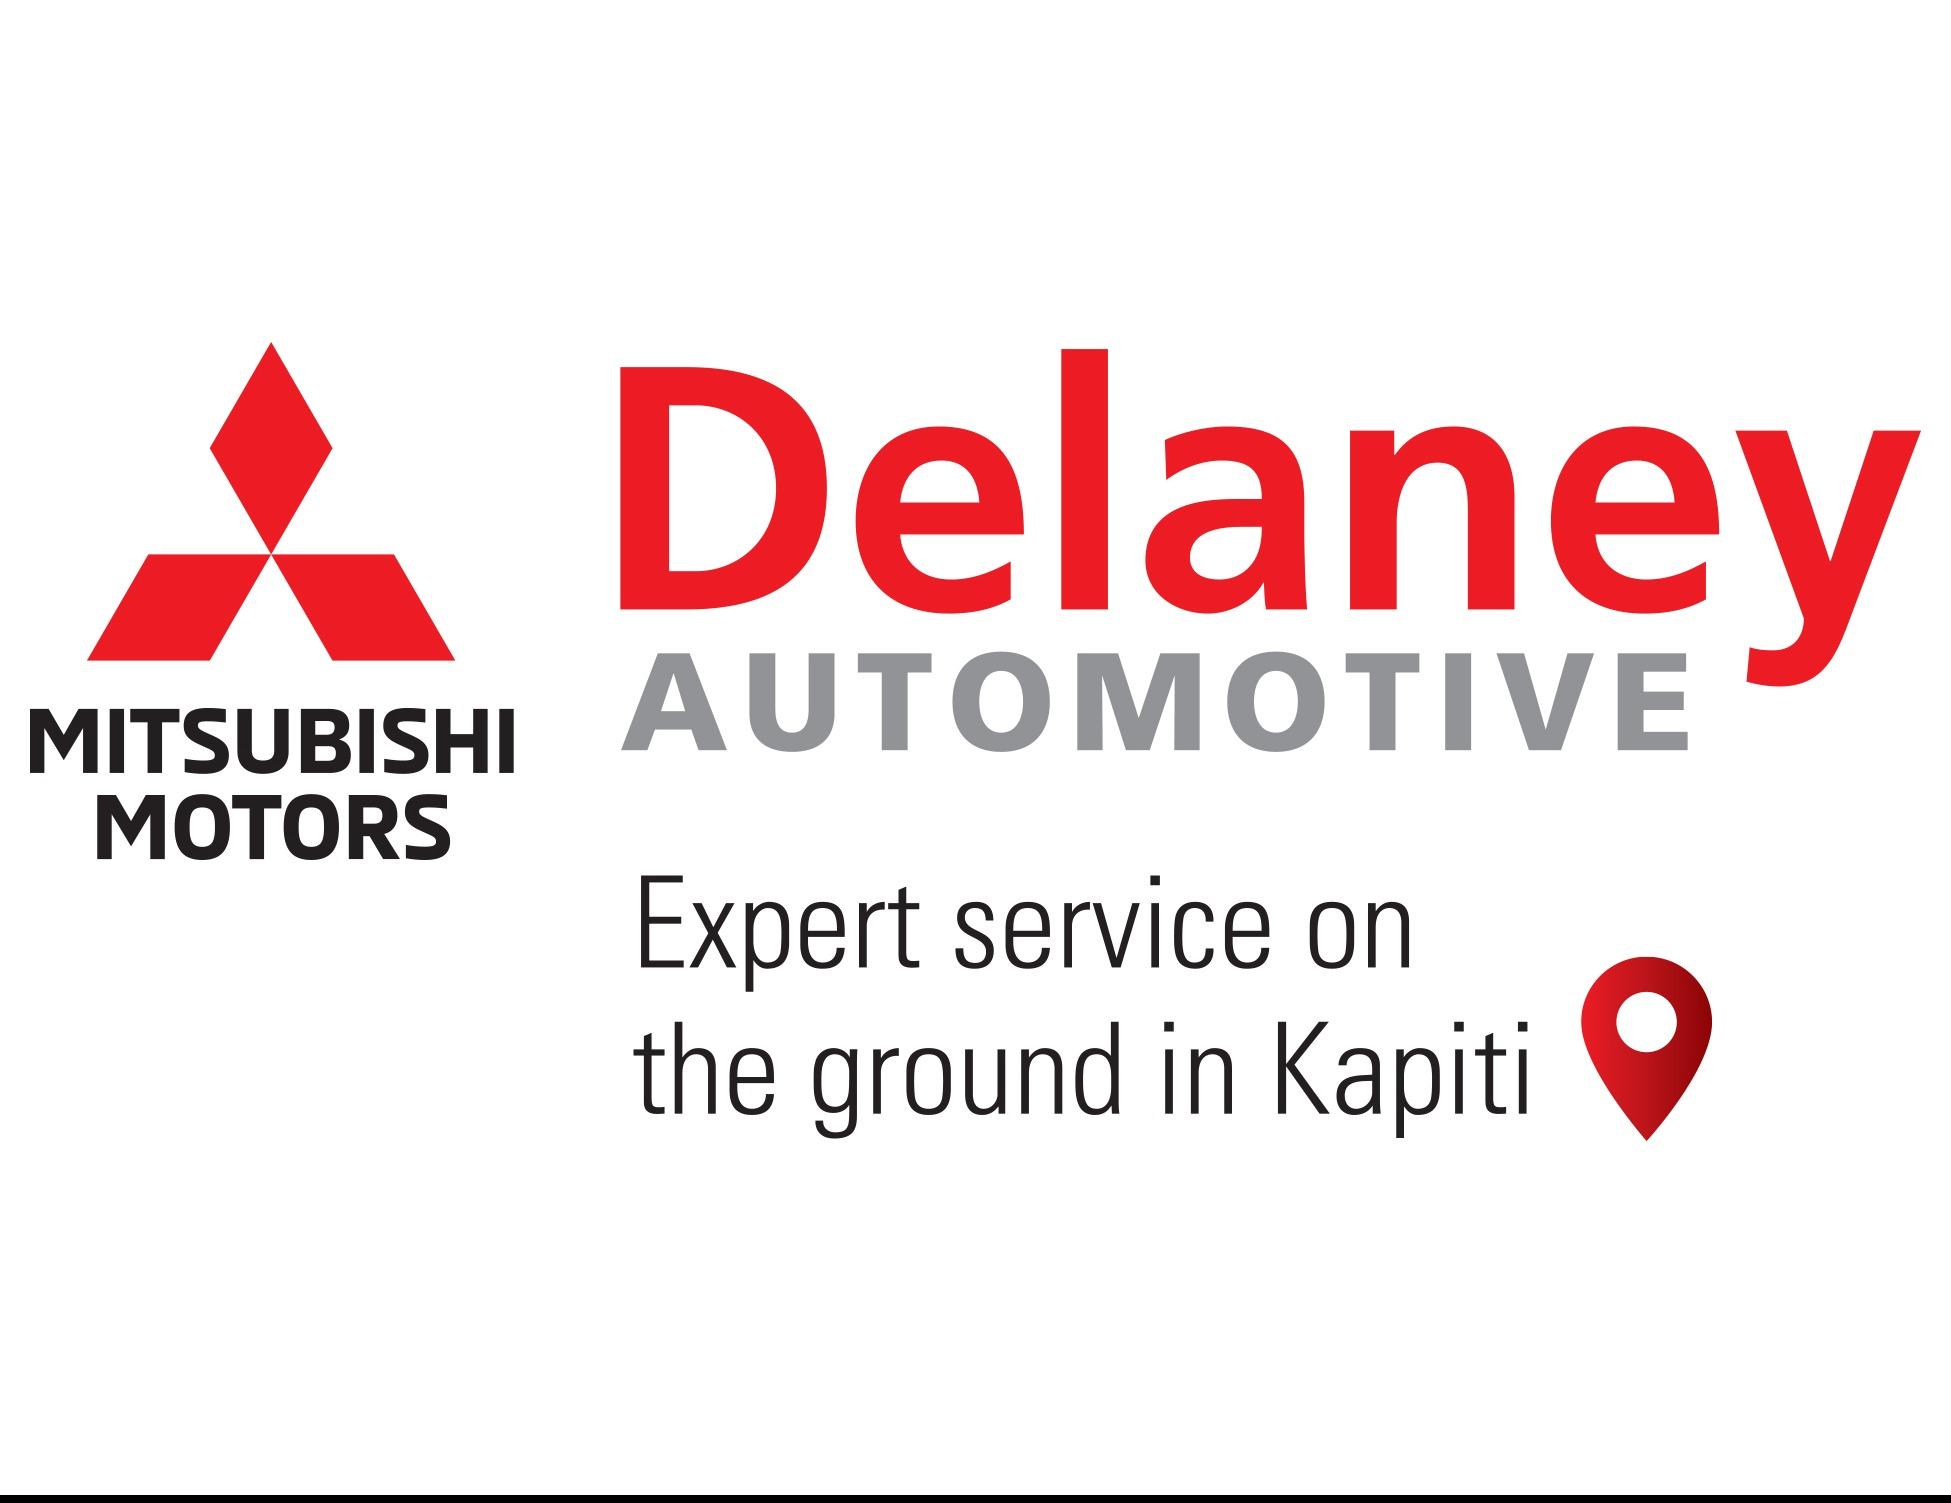 Delaney Mitsubishi